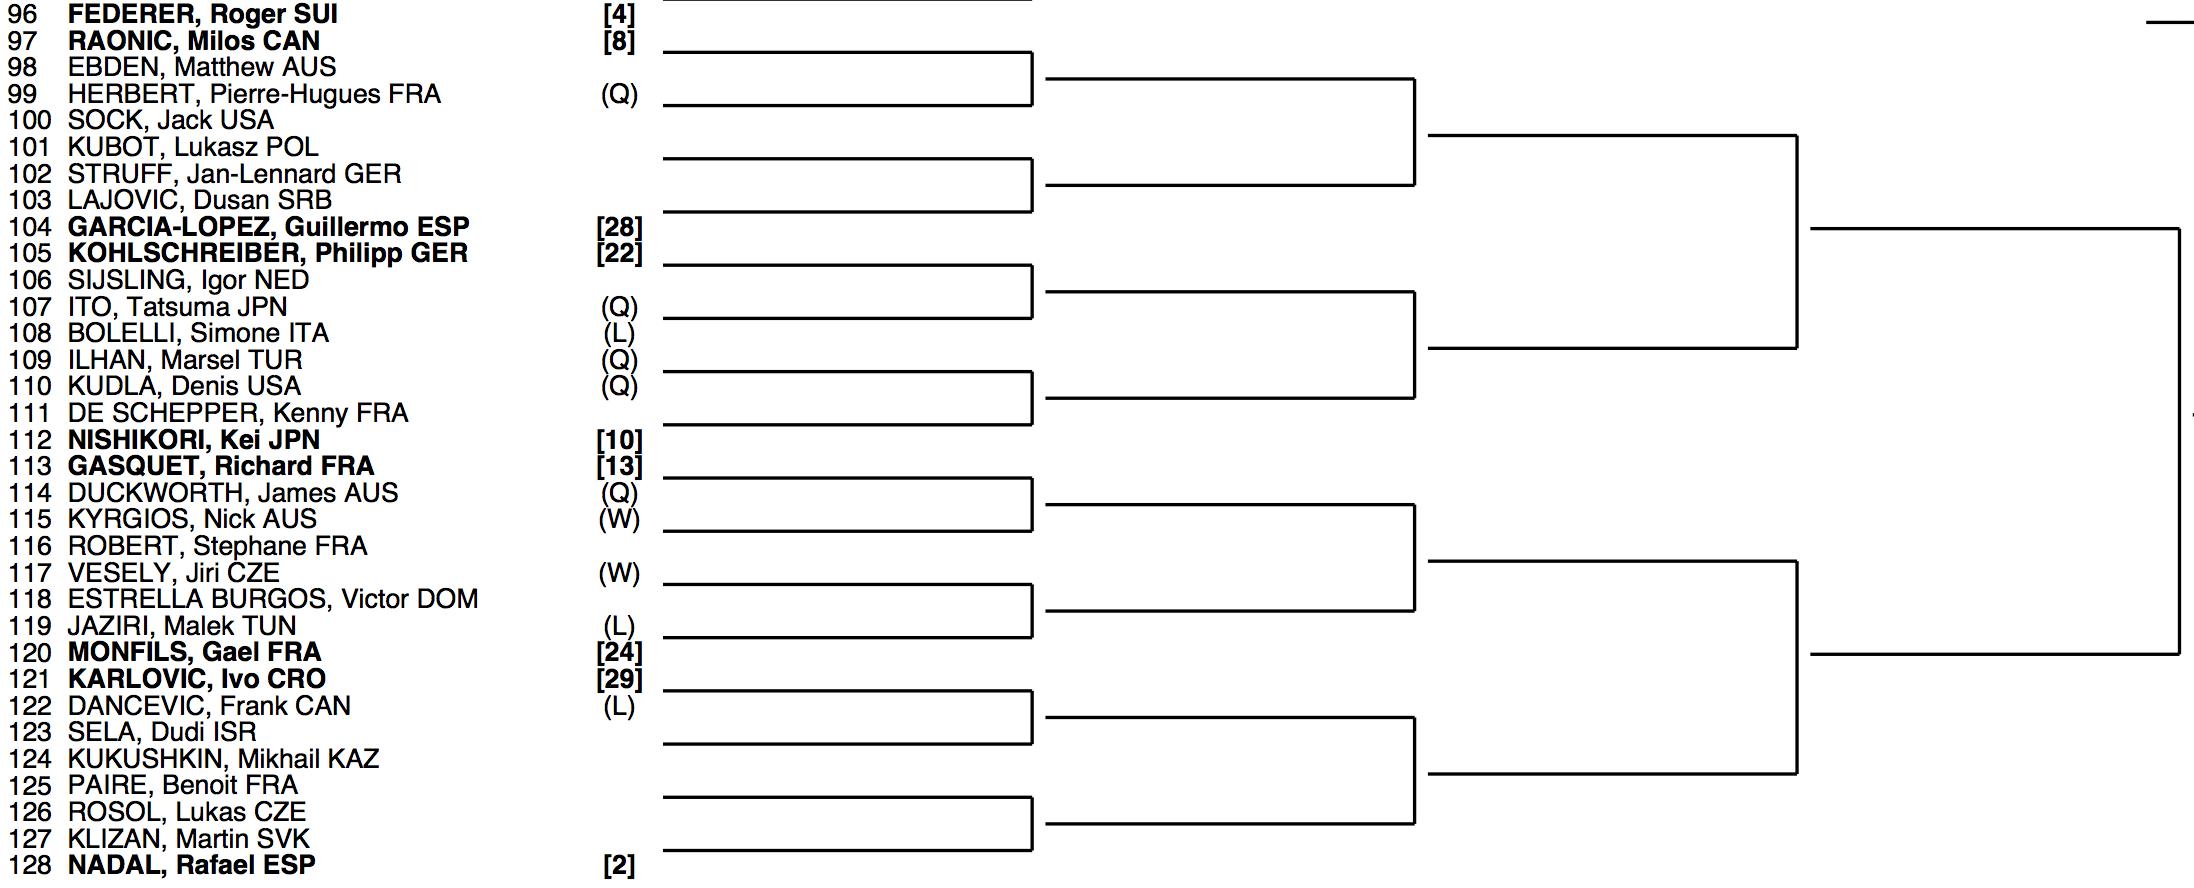 Wimbledon 2014 Draw